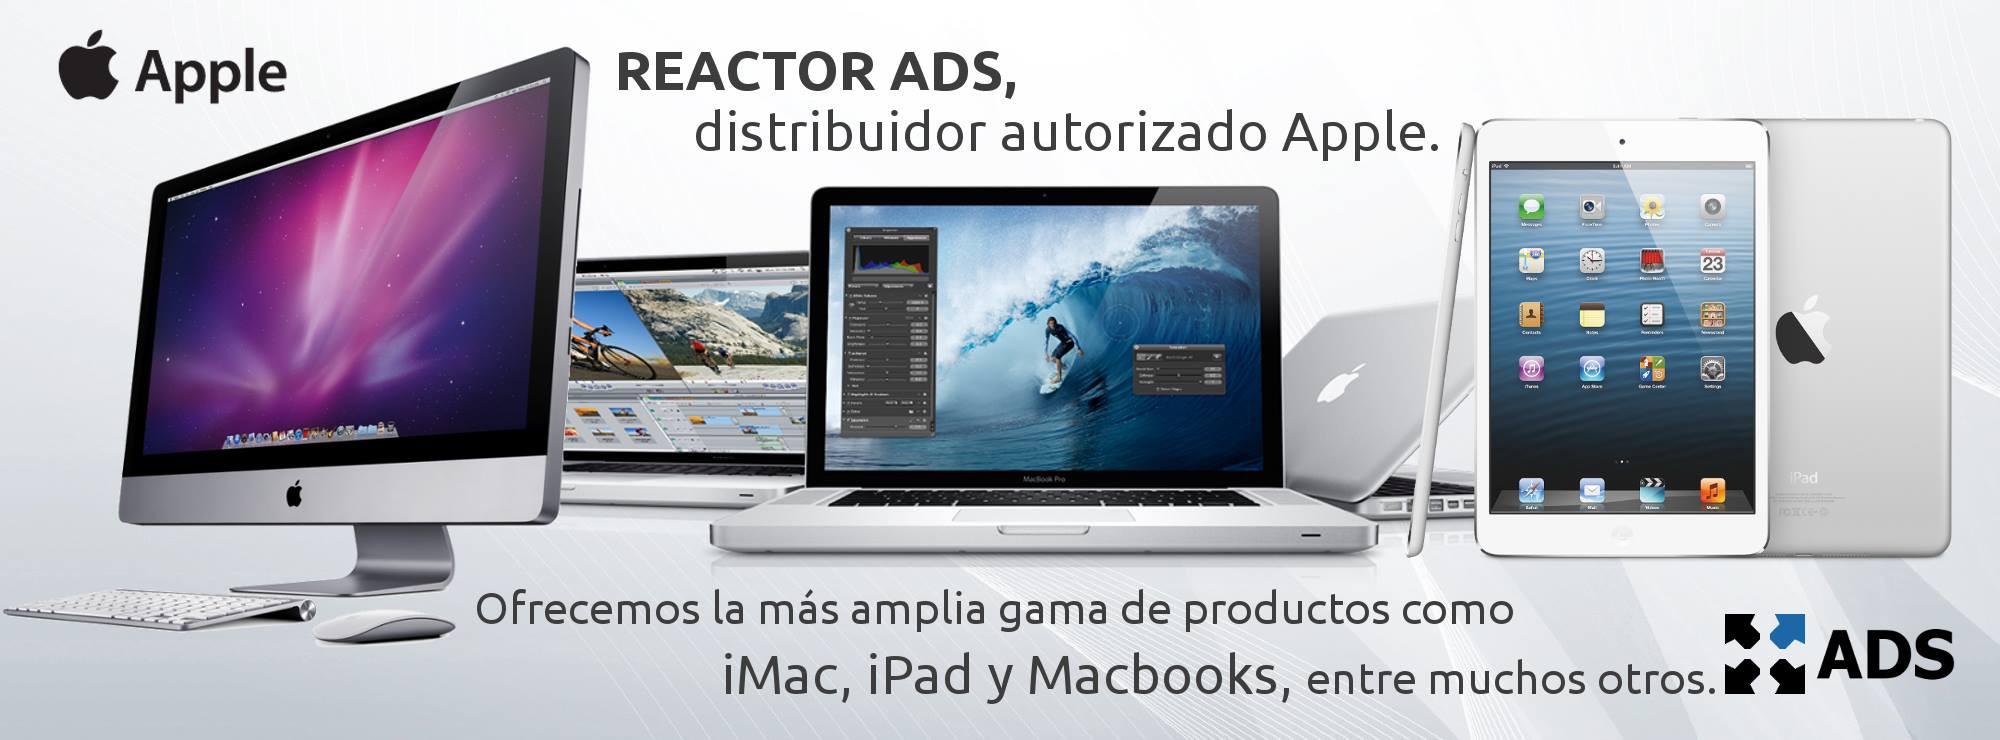 Reactor ADS